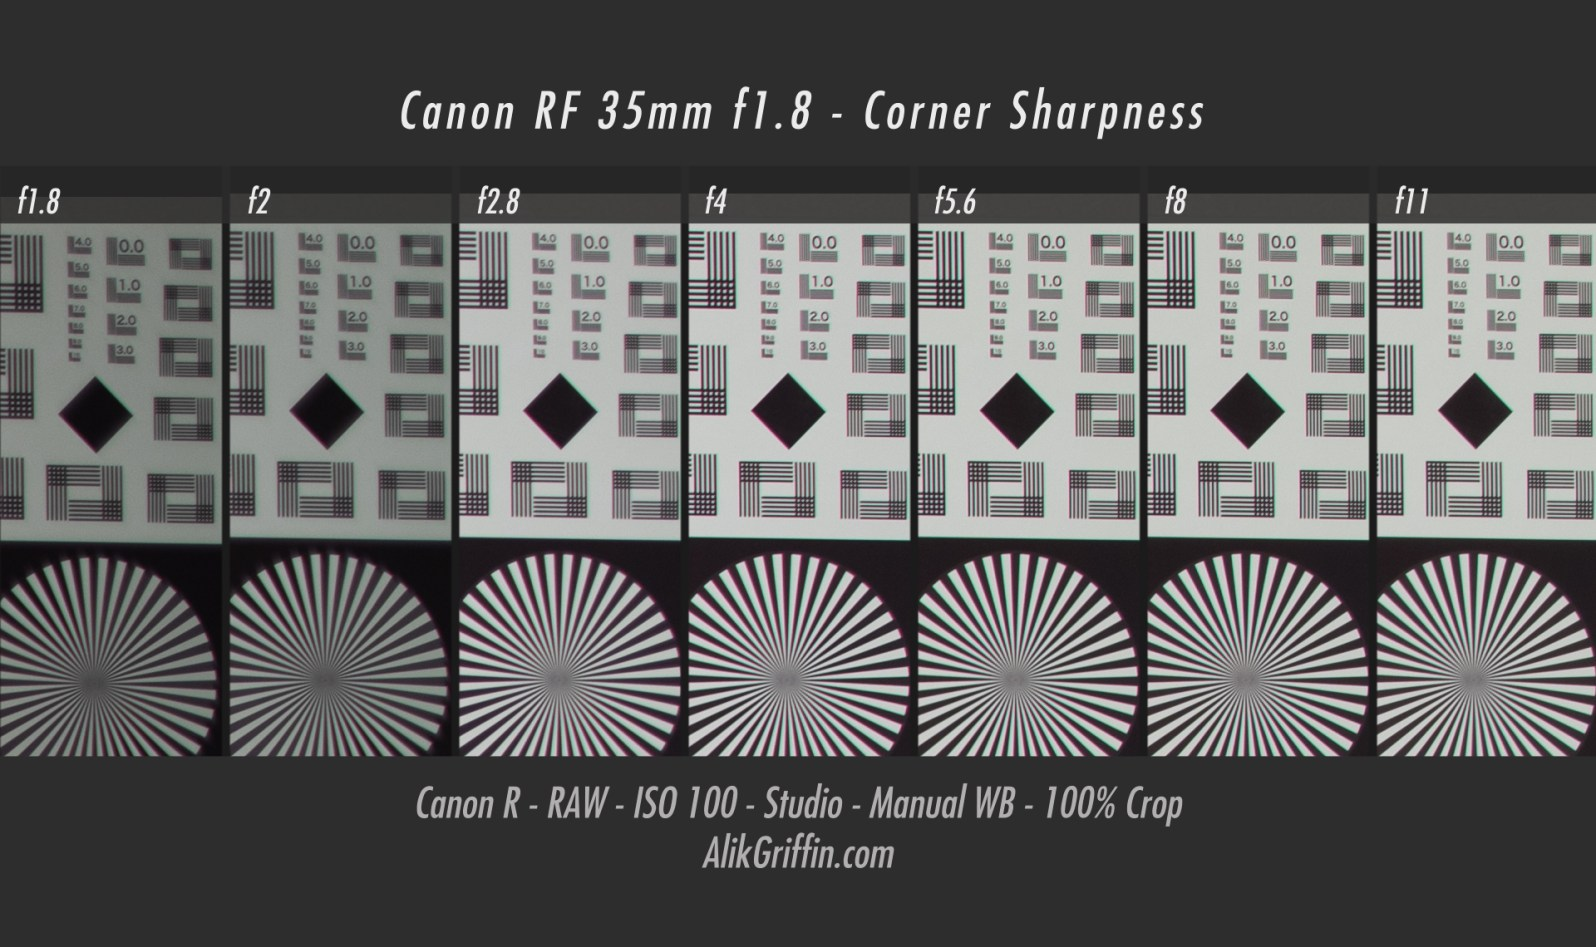 AlikGriffin_CanonRF35mmf1.8_Sharpness_Corner